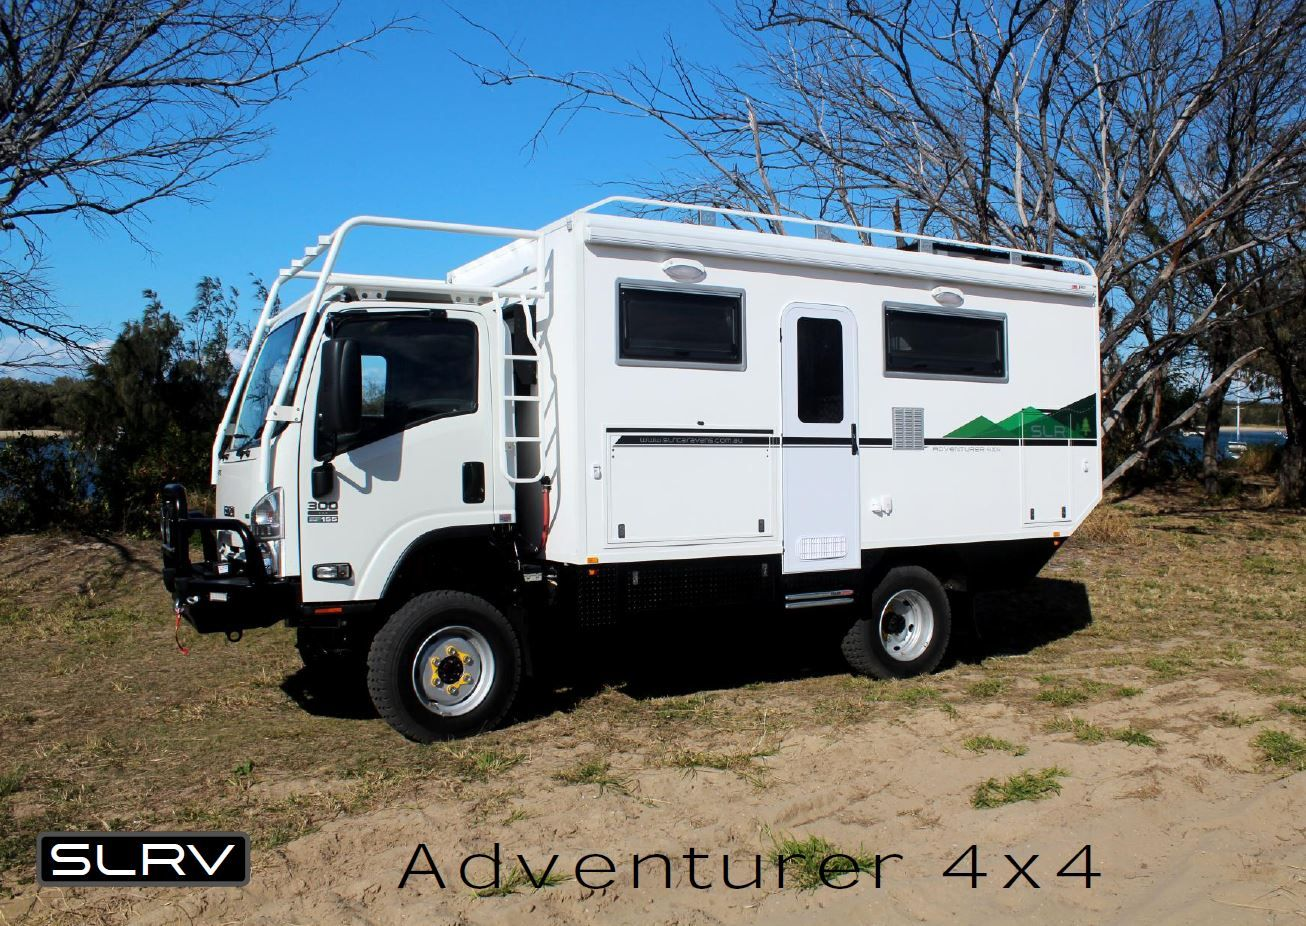 Slr Adventurer 4x4 Expedition Vehicle 4x4 Motorhome Isuzu Nps300 Expedition Vehicle Vehicles Motorhome